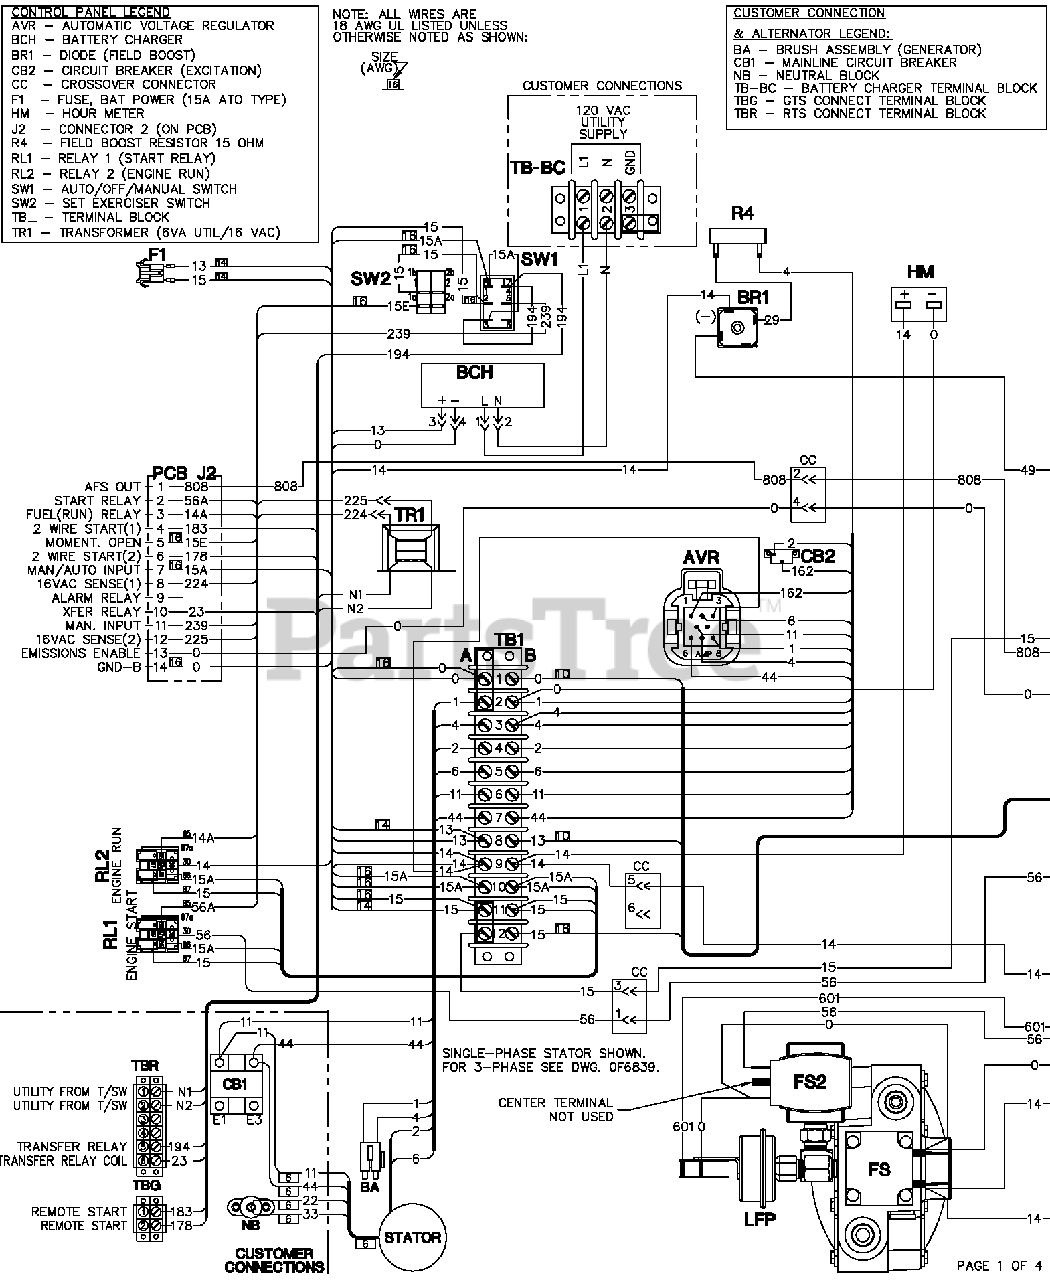 Generac Qt04842gnan - Generac 48kw Home Standby Generator  Sn  5449154